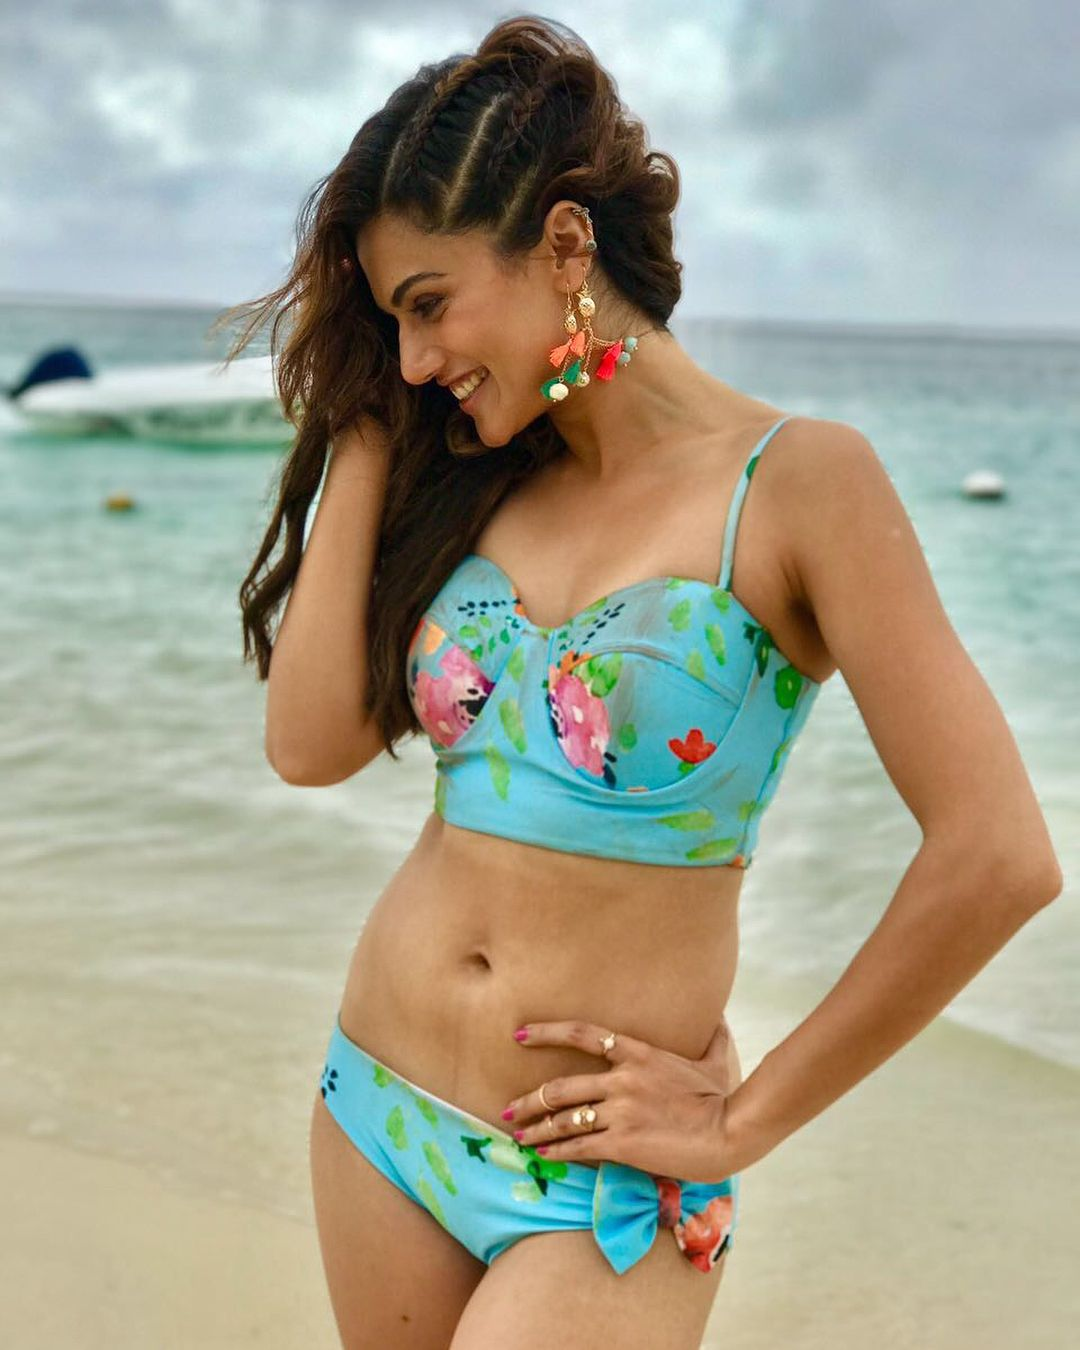 taapsee pannu hot bikini stills from judwaa 2. | bikinis